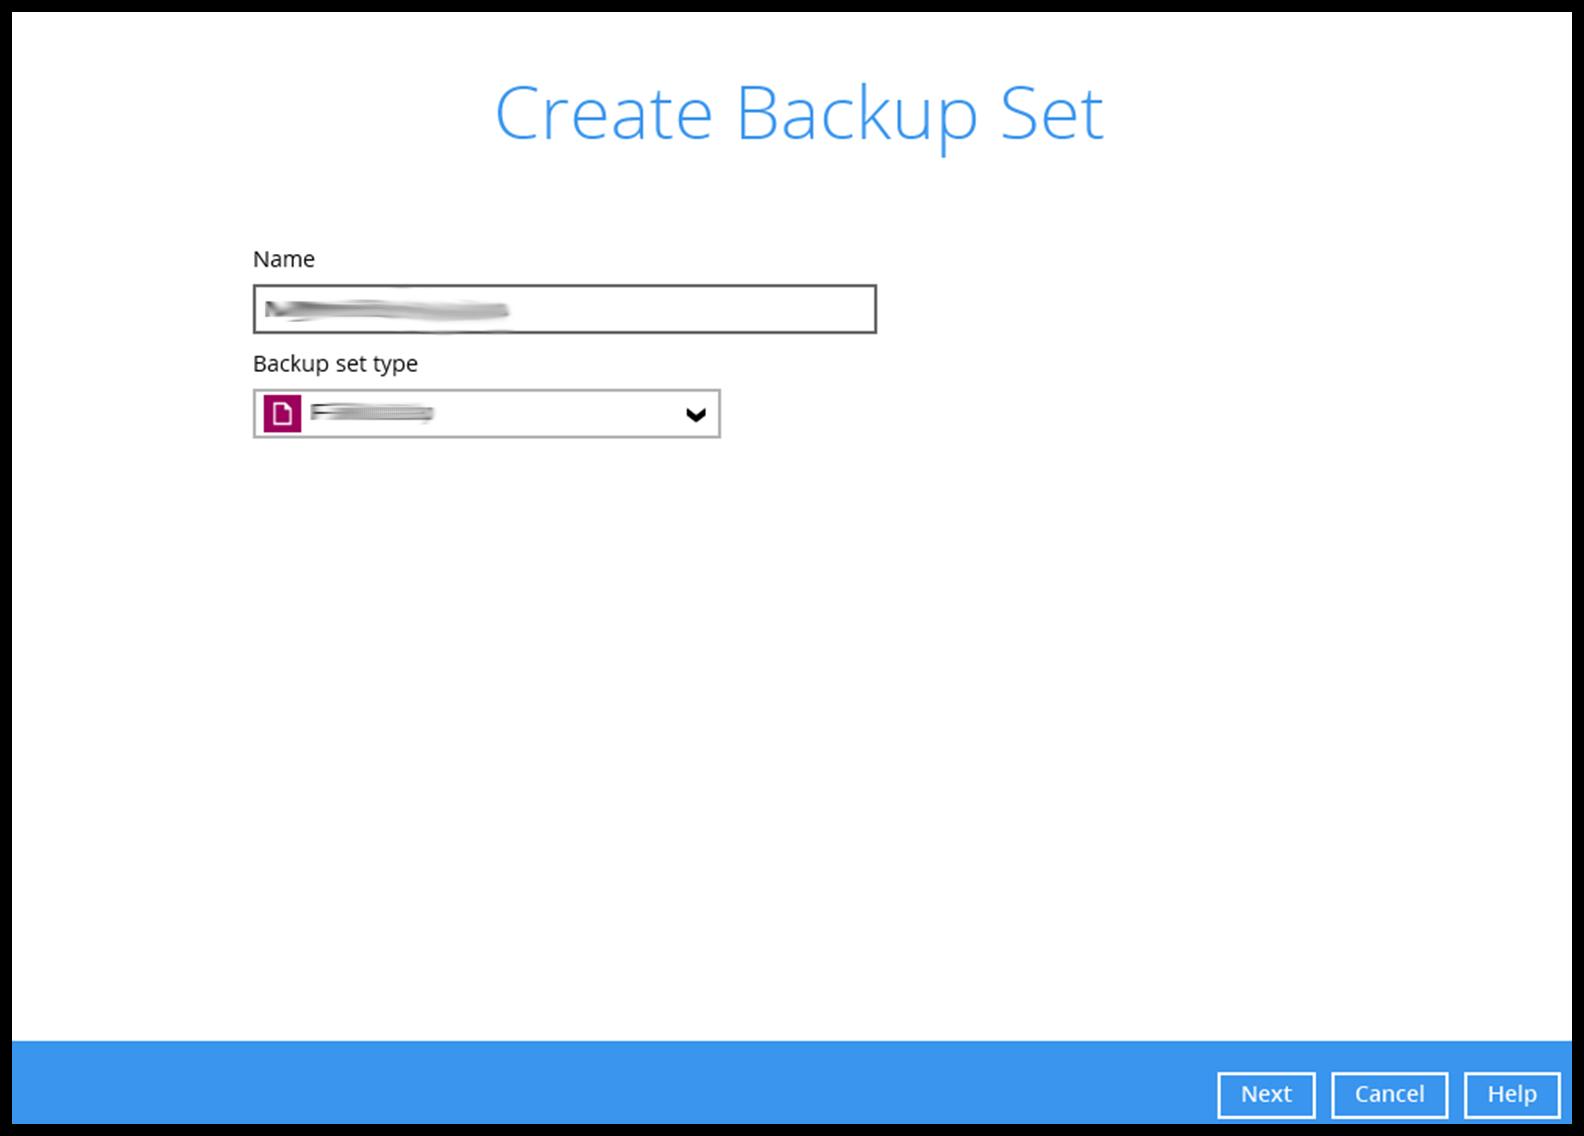 Vm create backup set